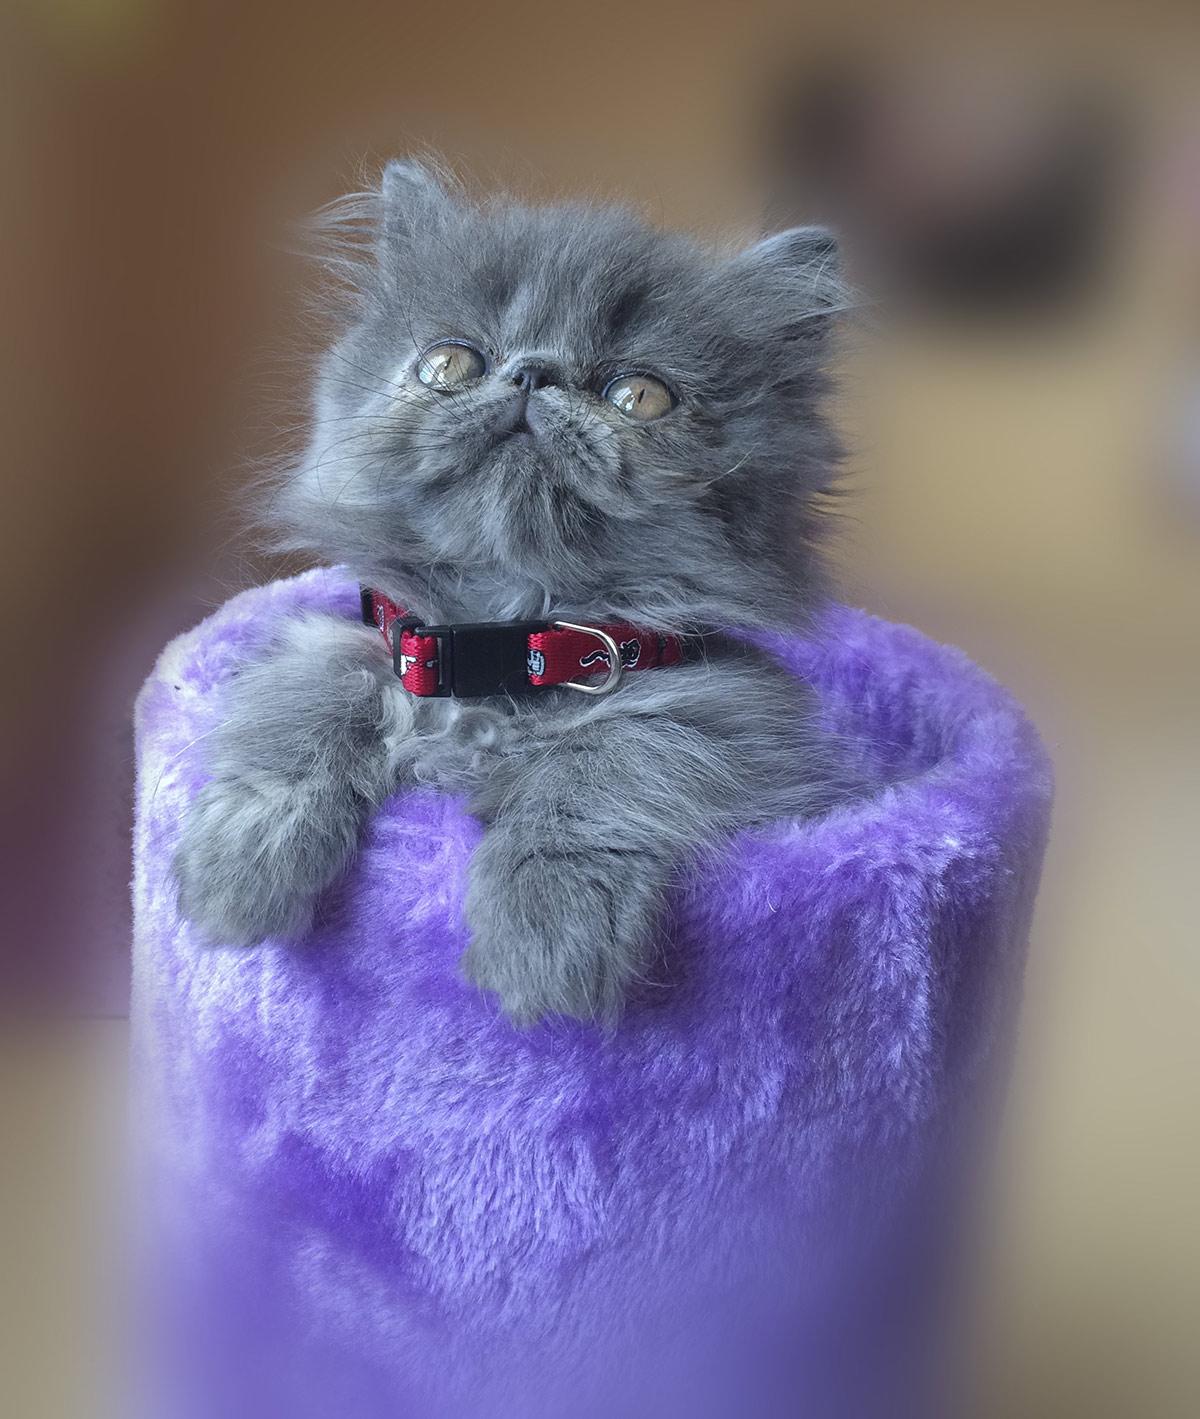 flat faced kittens - brachycephalic cats